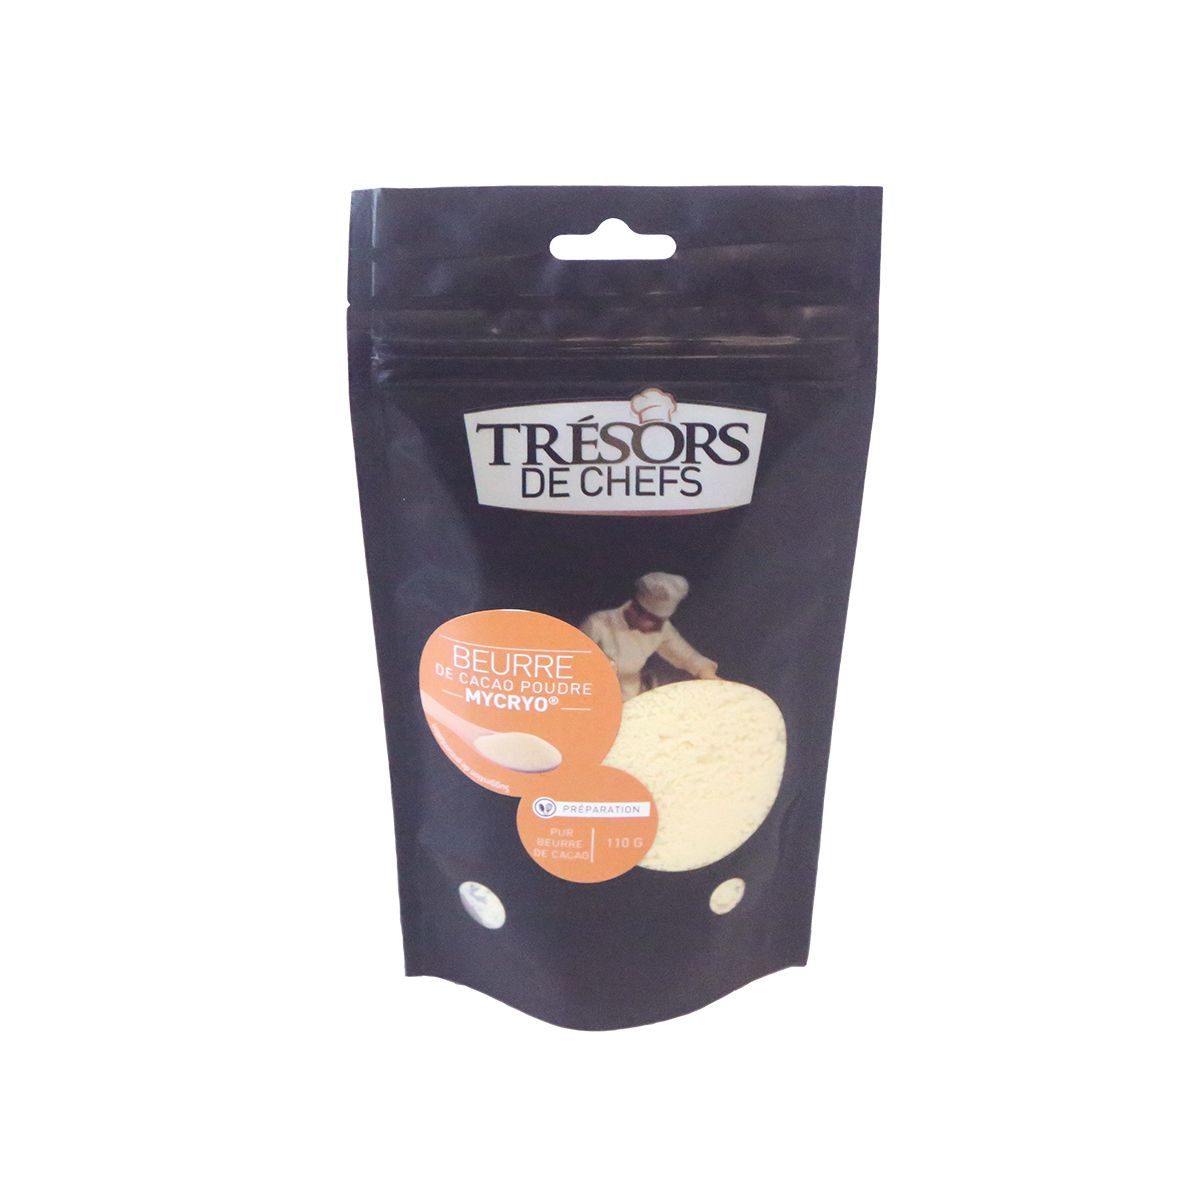 Beurre de cacao mycryo 110 gr - Trésors de chefs